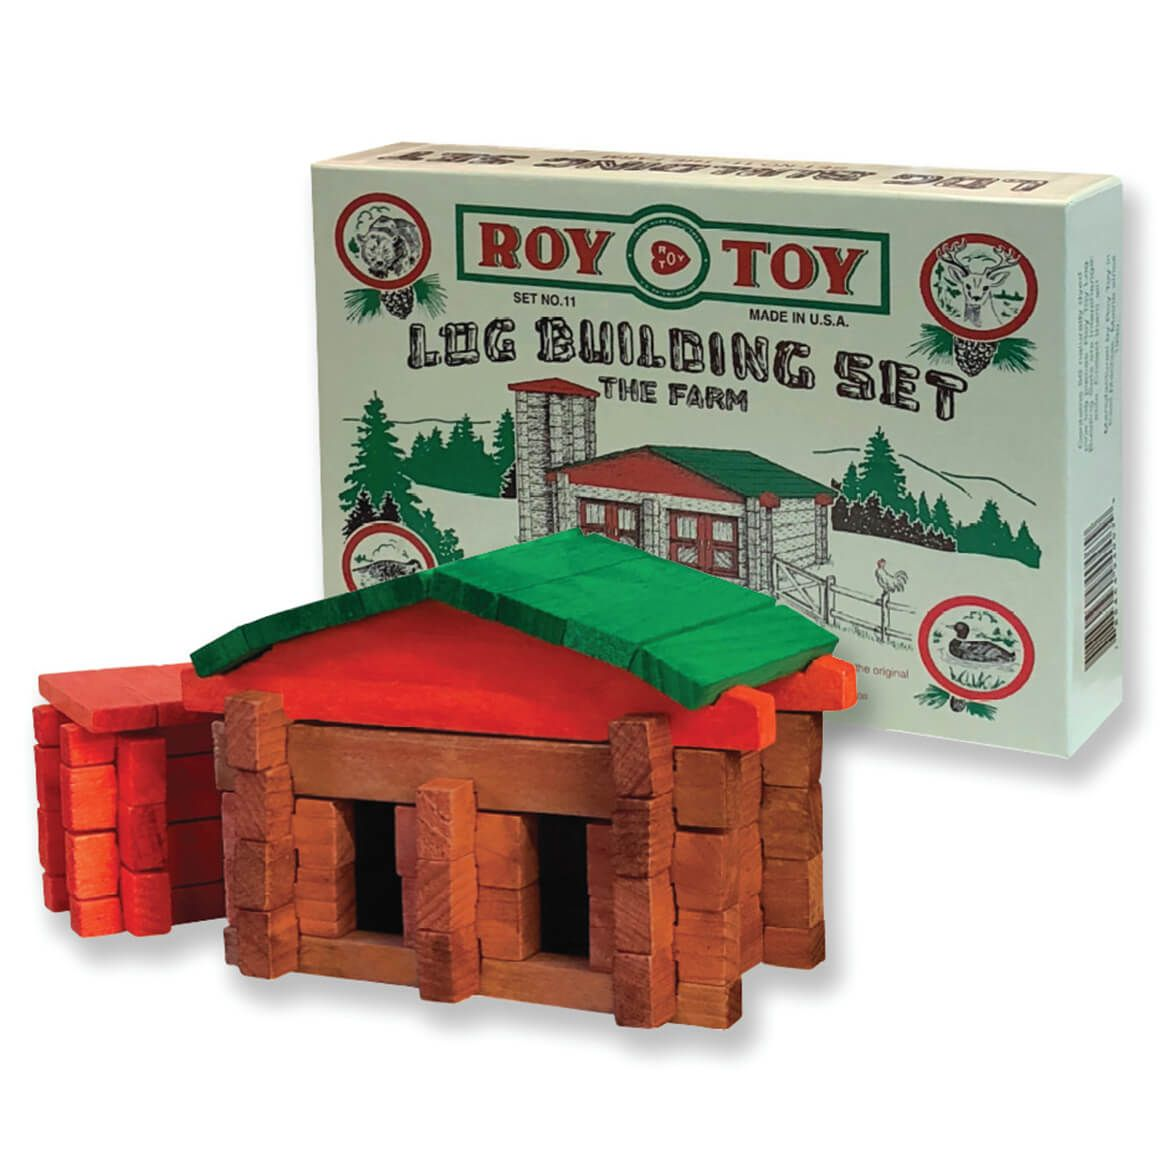 Roy Toy Log Building Set – The Farm-372315